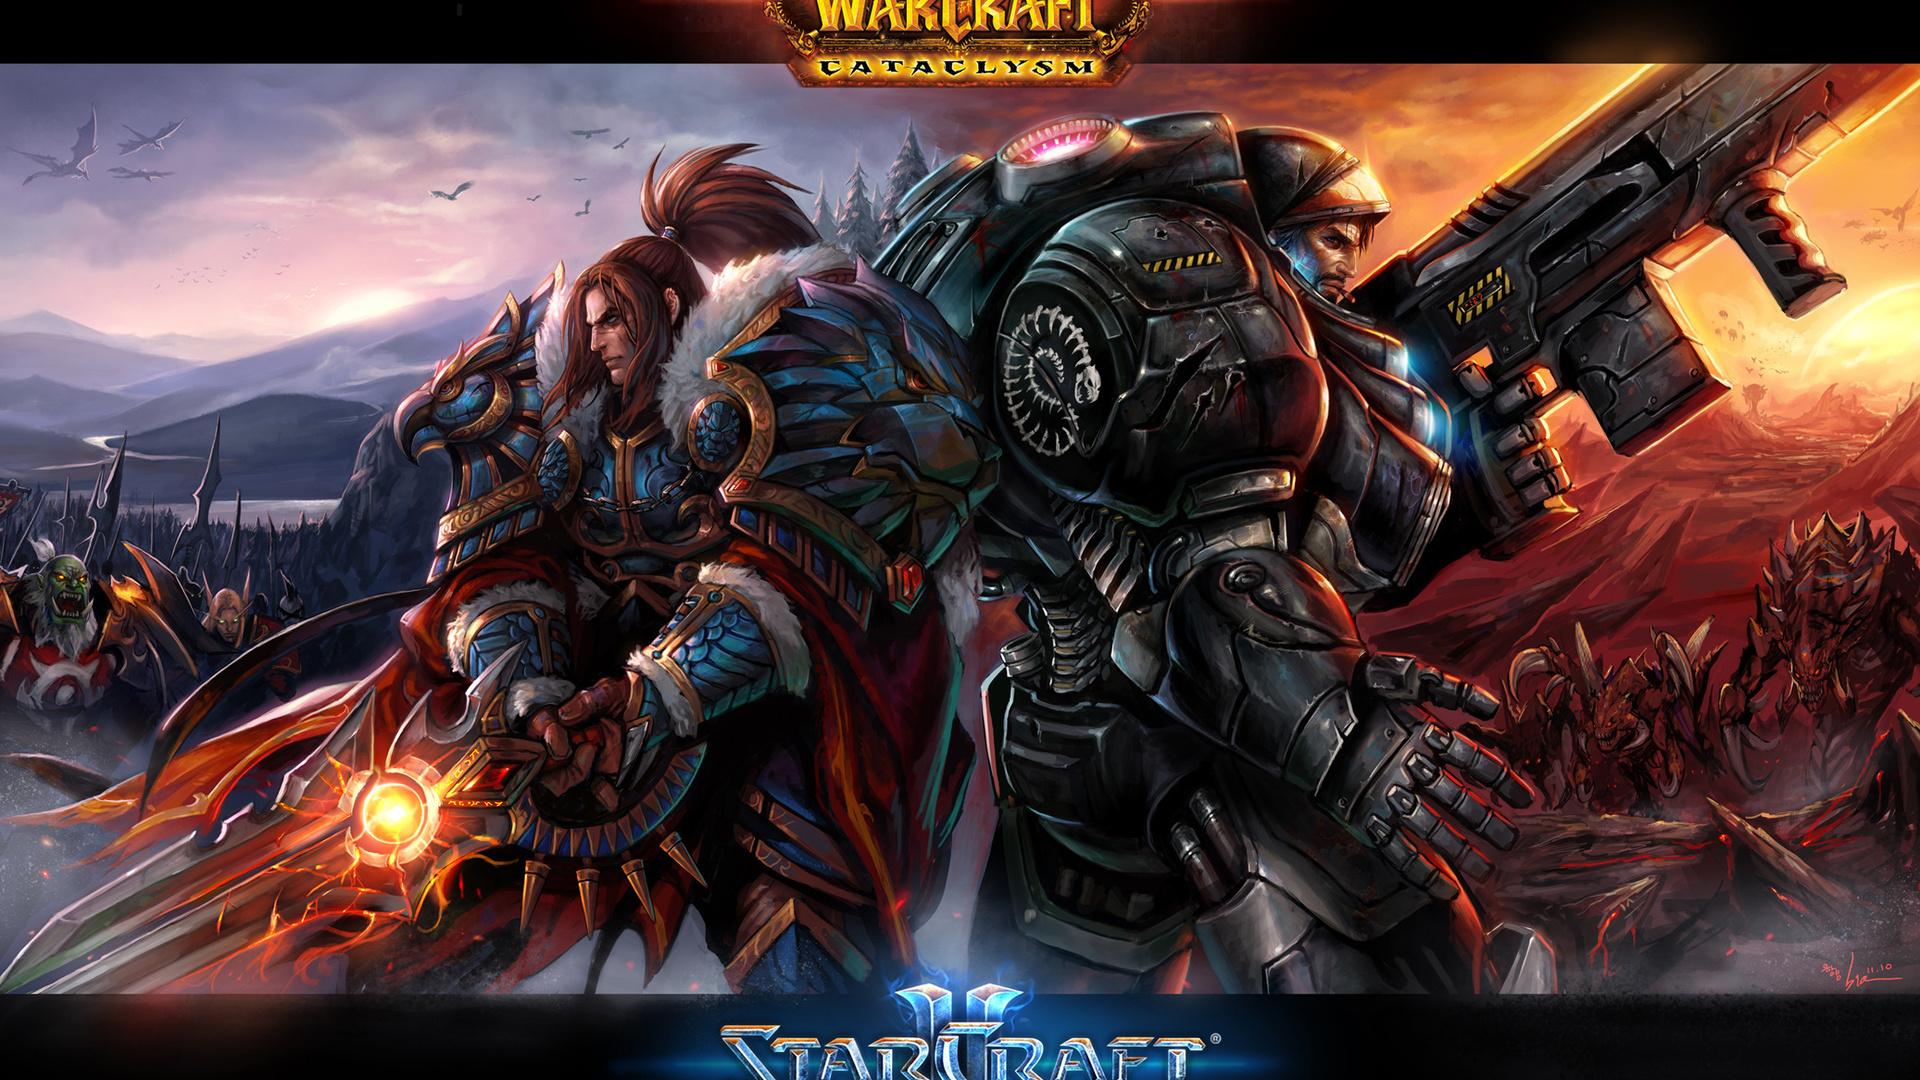 Warrior couple world of warcraft wallpaper Wallpaper Wide HD 1920x1080